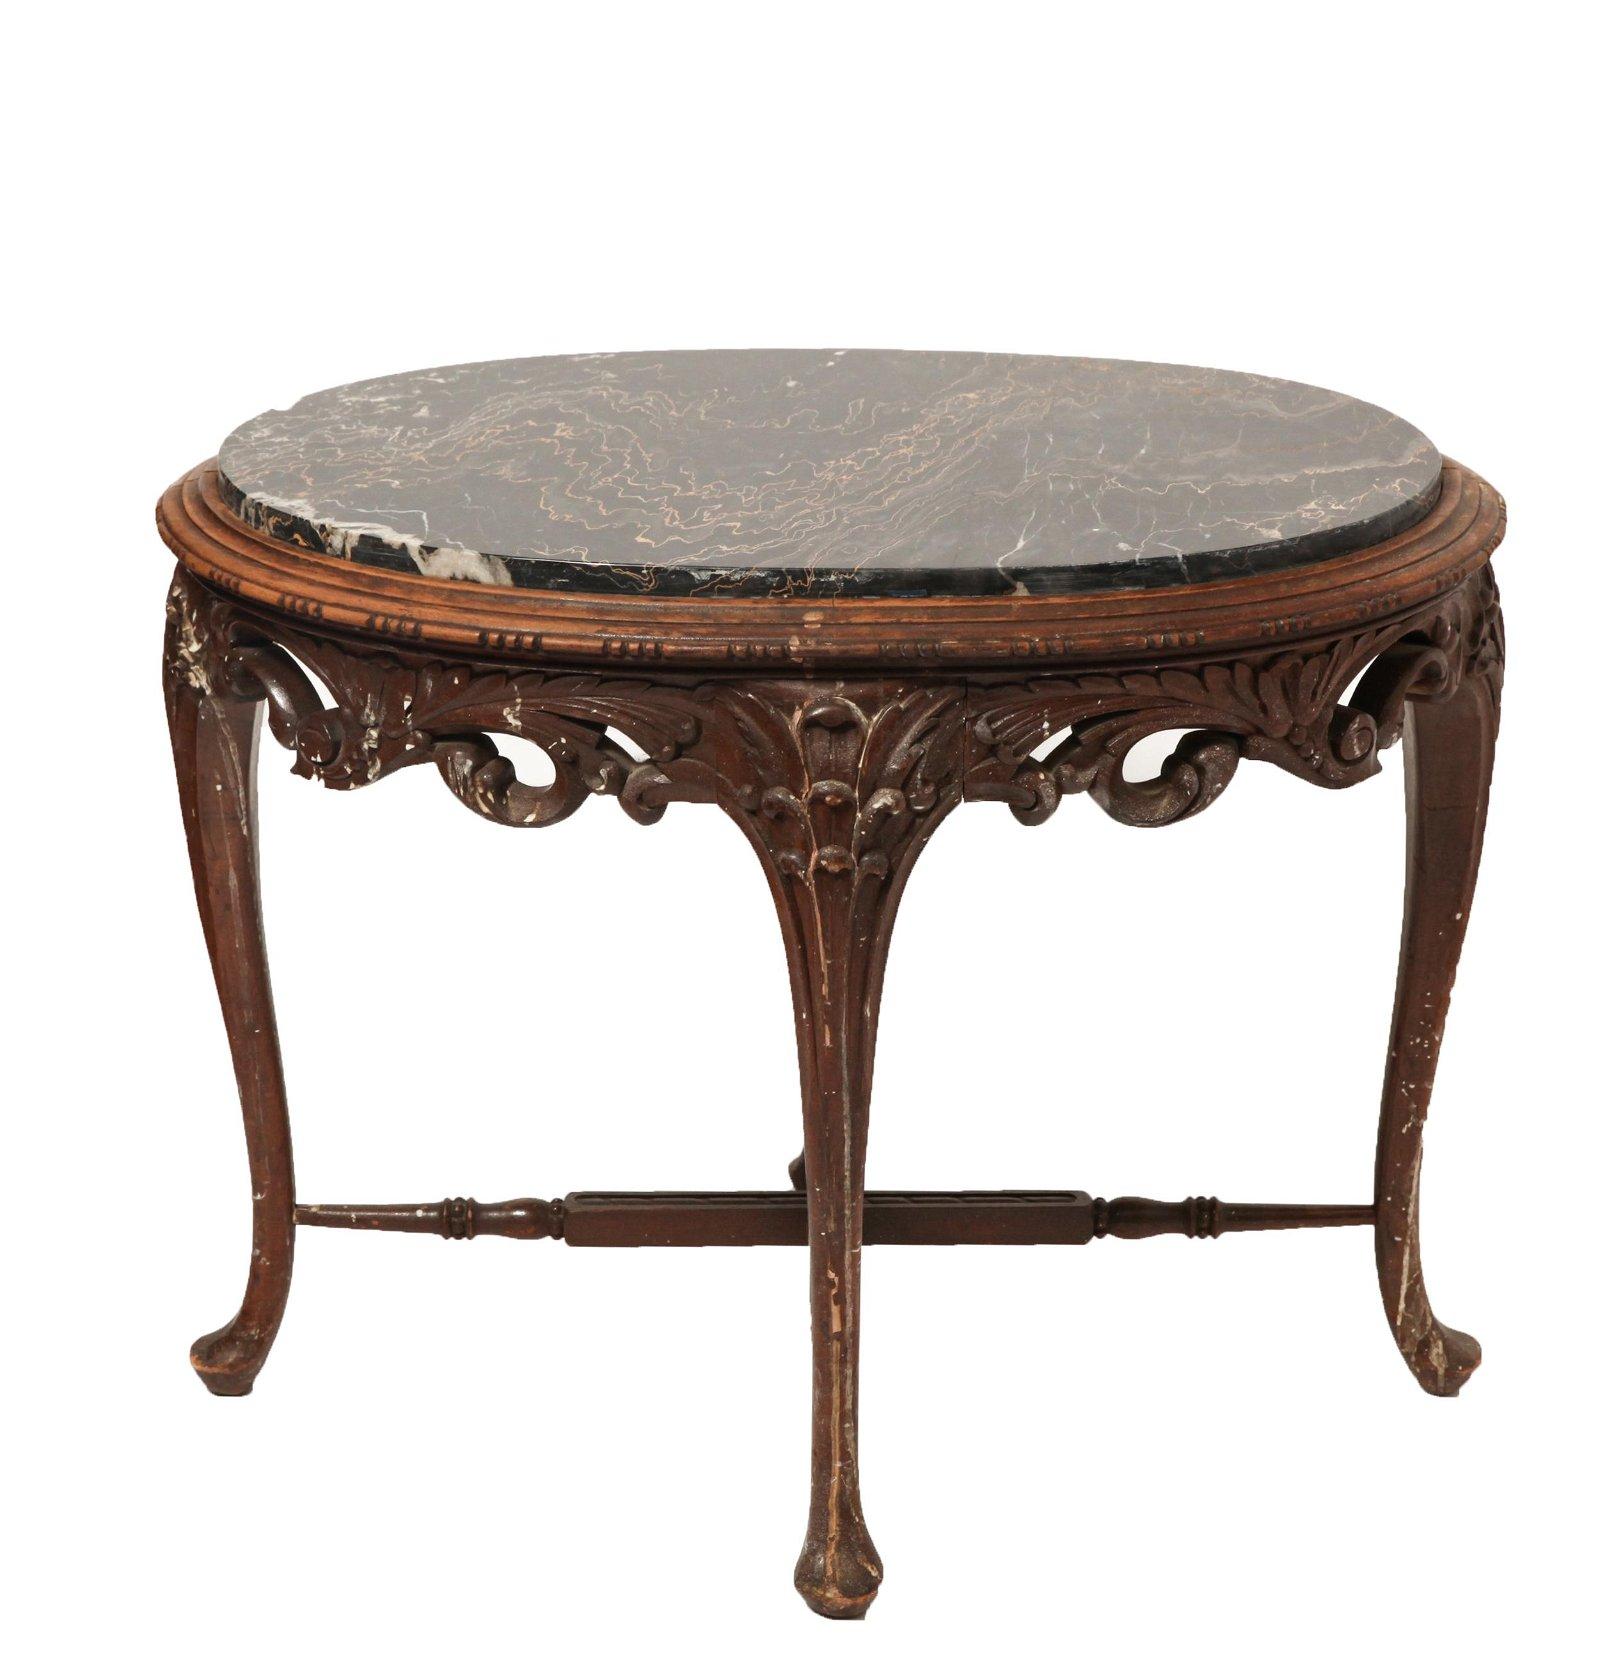 Art Nouveau Oval Marble Top Table